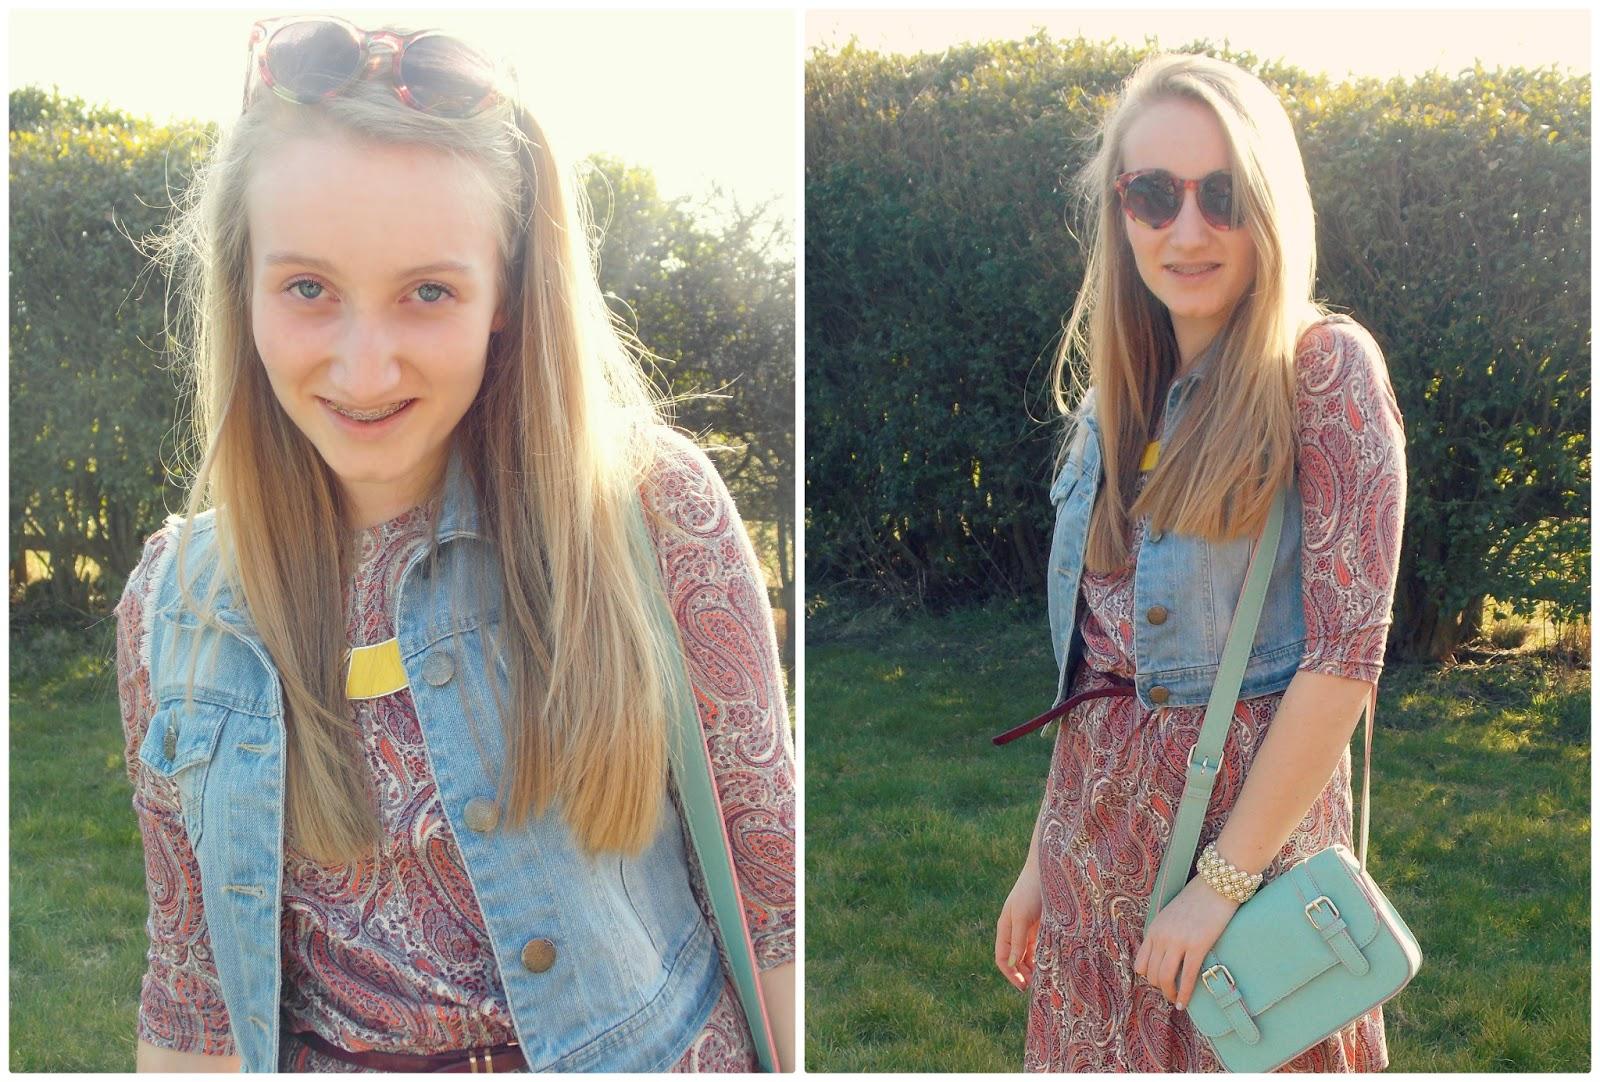 Blondies Style Fix, UK Fashion Blogger Paisley Dress, Satchel, Denim Jacket, Sun Glasses